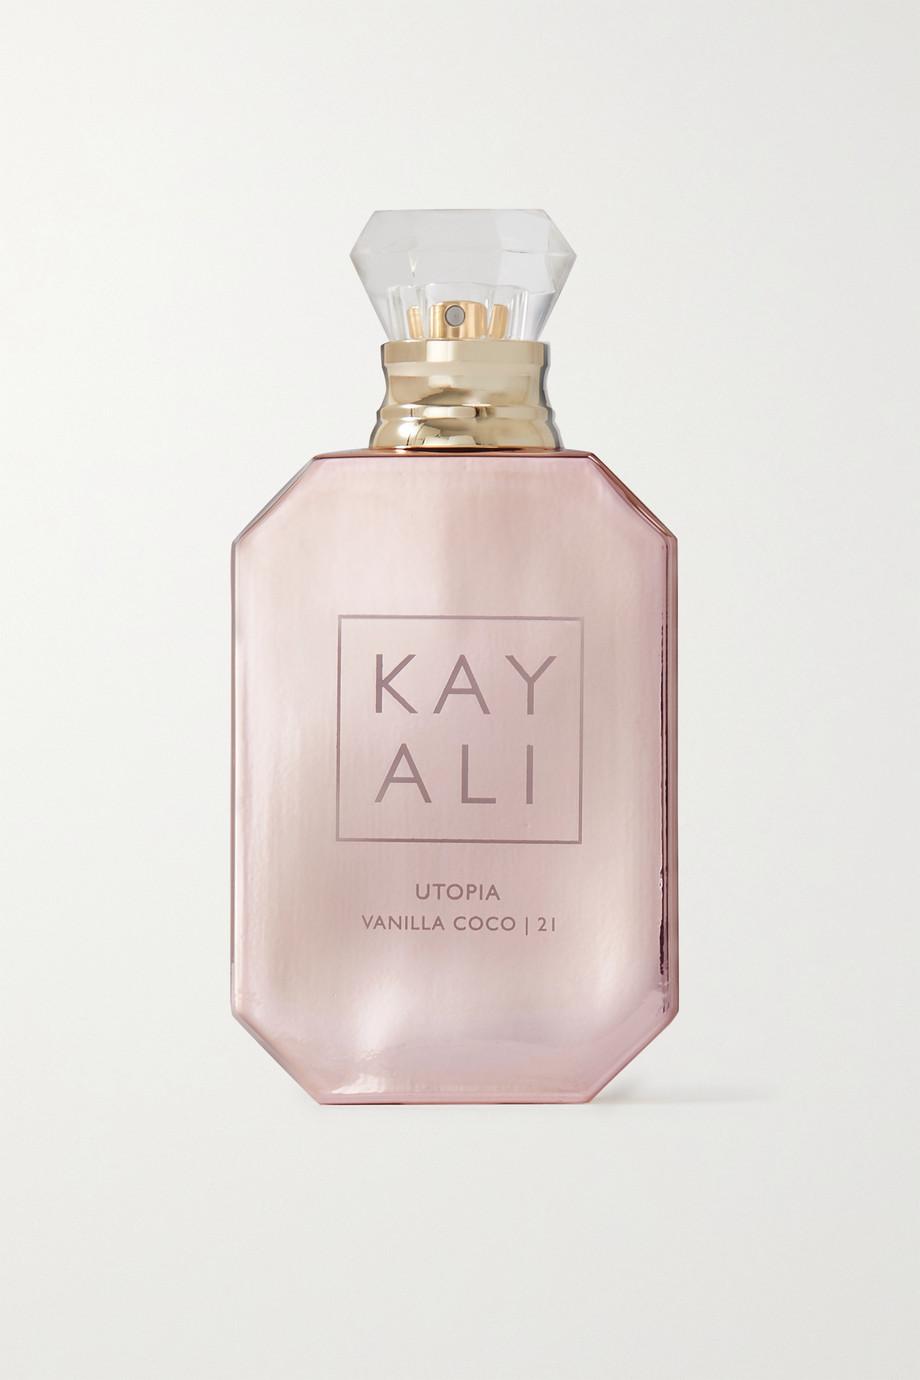 Huda Beauty Eau de parfum Kayali, Utopia Vanilla Coco 21, 100 ml